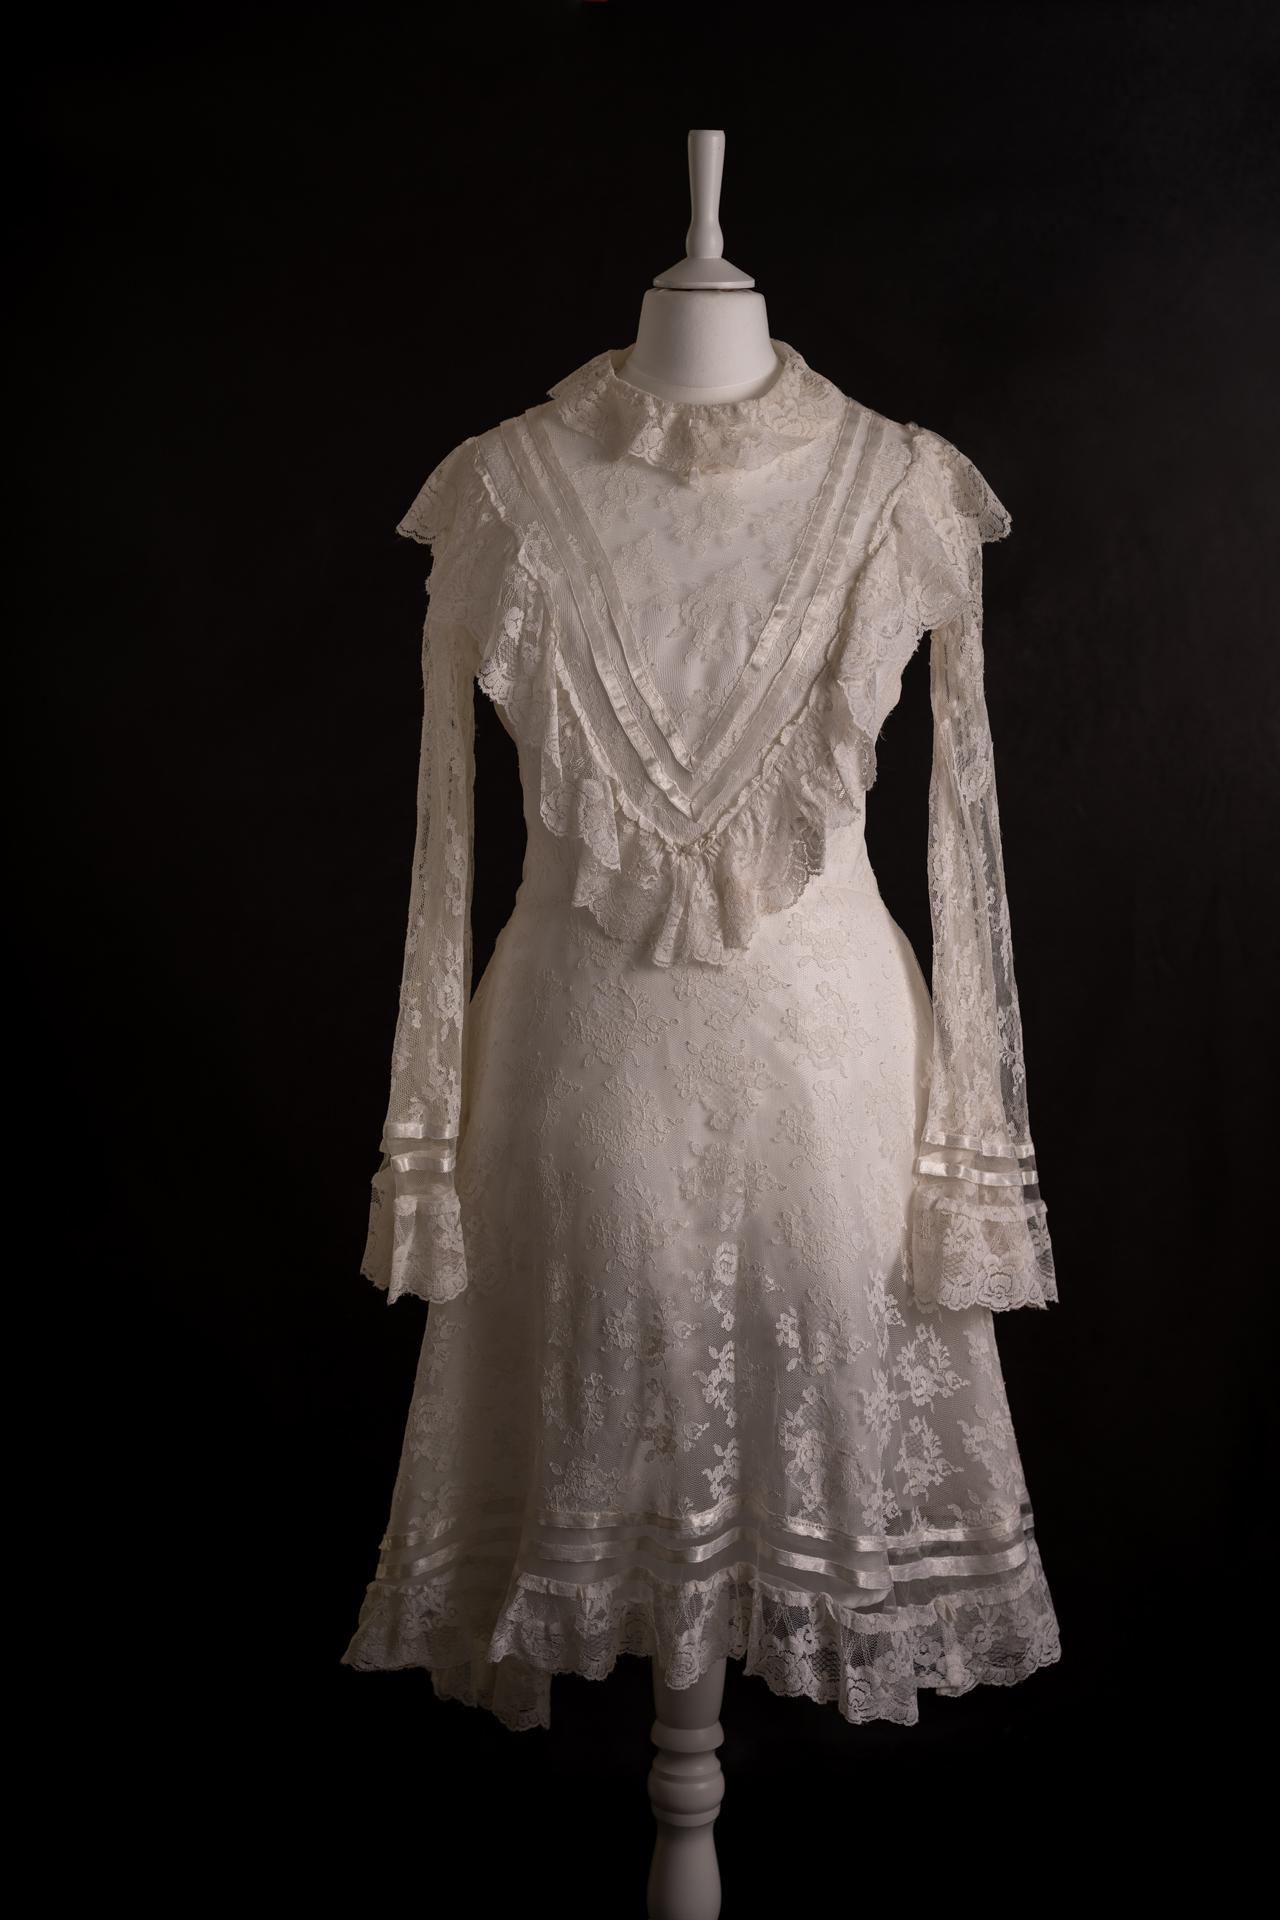 Robe vintage en dentelle blanche